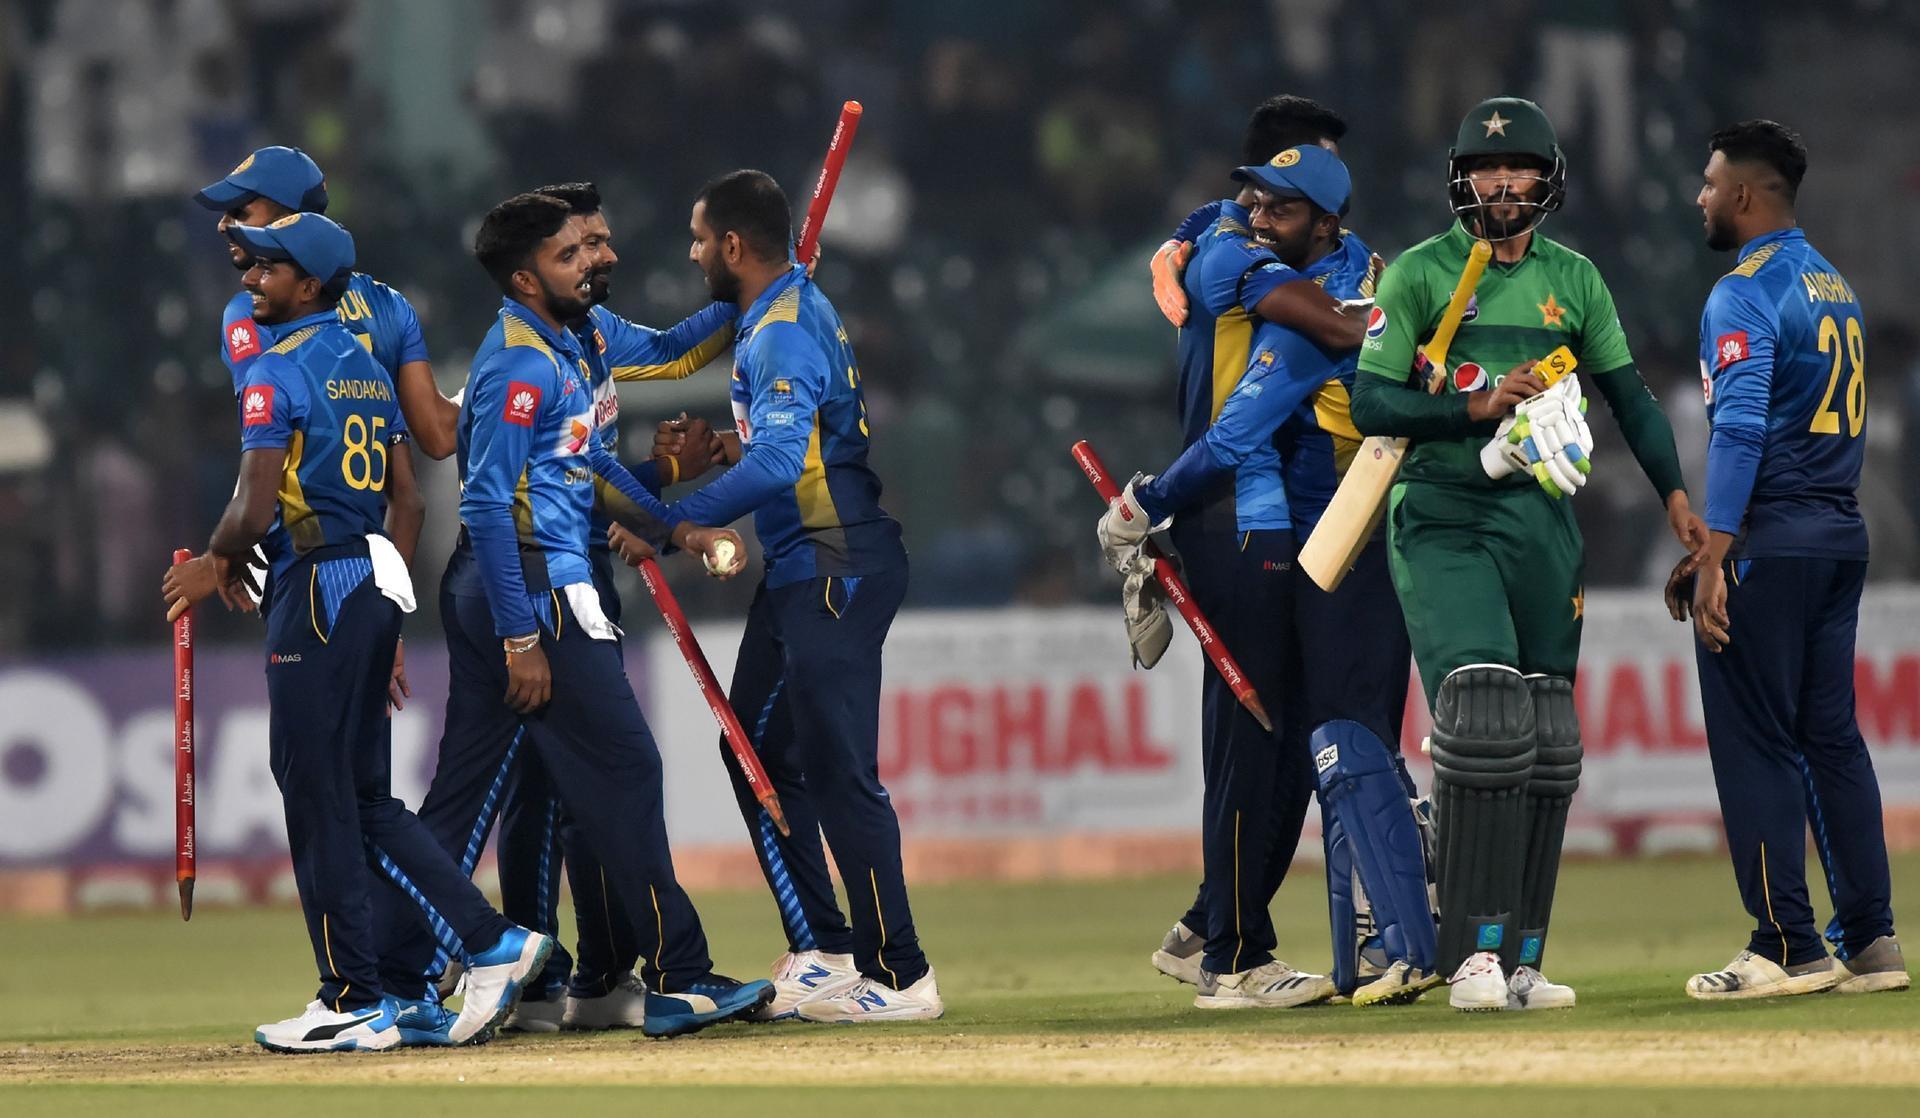 5 takeaways from Sri Lanka's historic tour of Pakistan